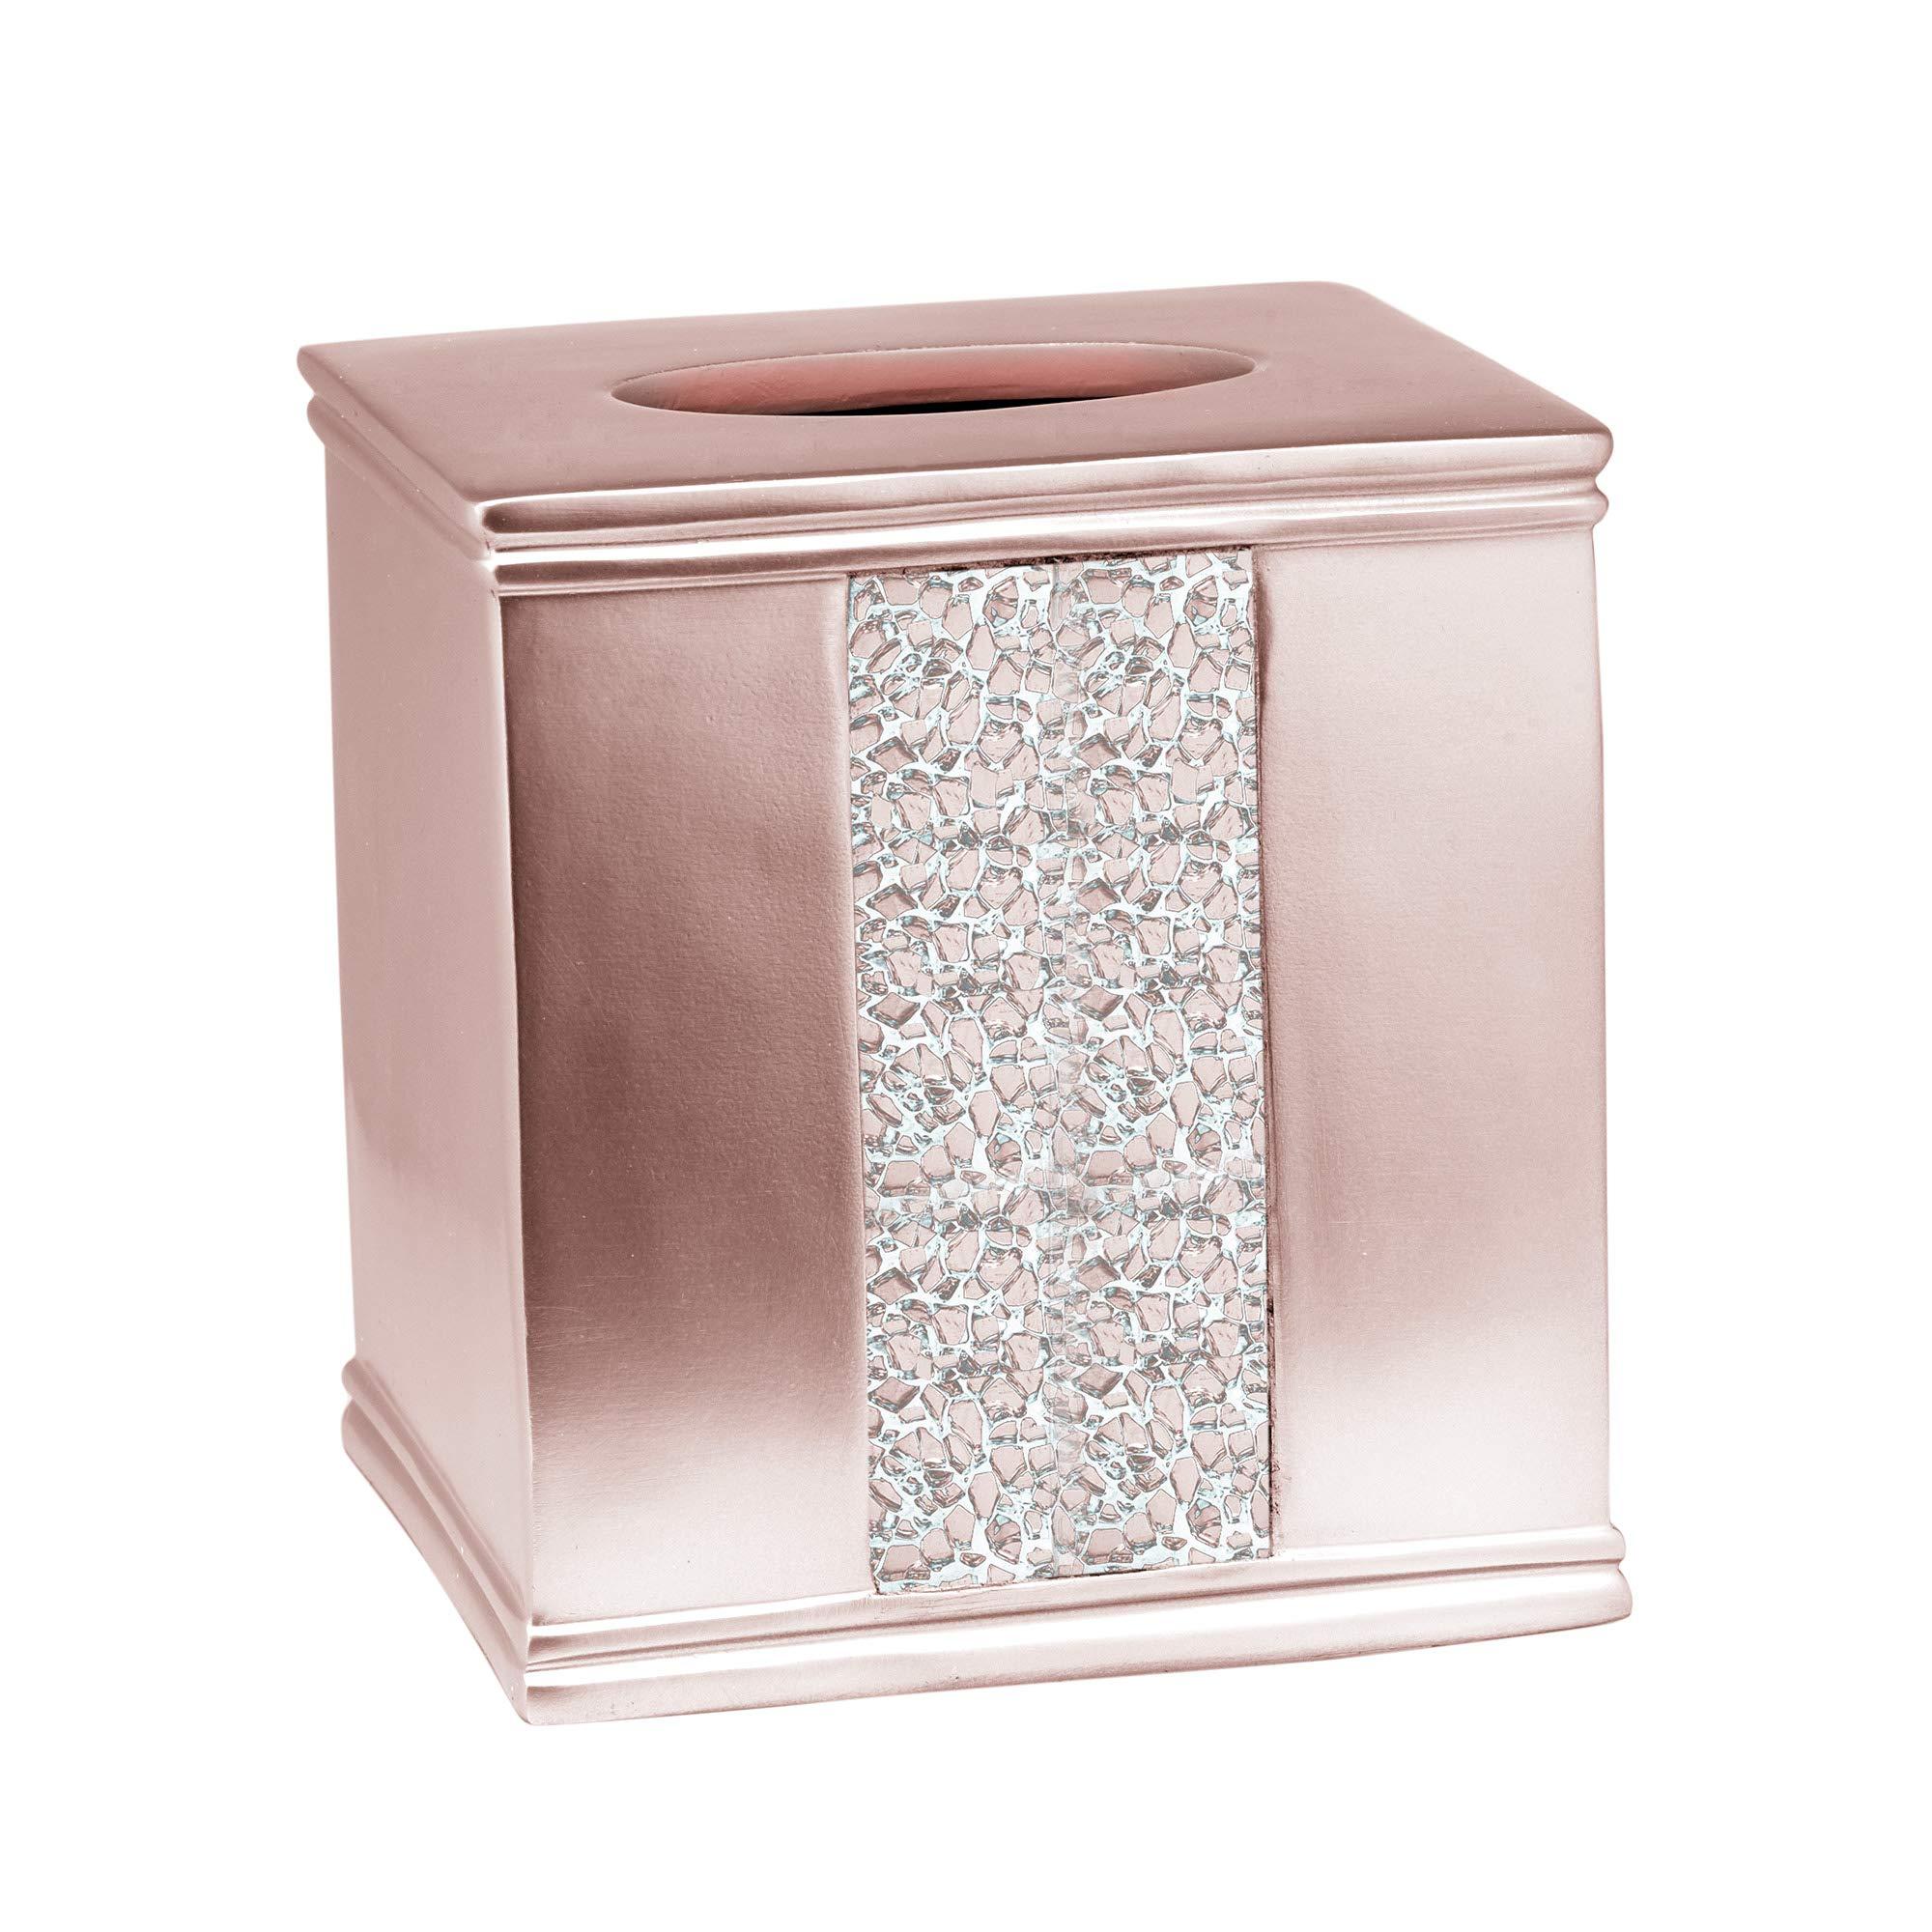 Popular Bath Sinatra Tissue Box, Blush